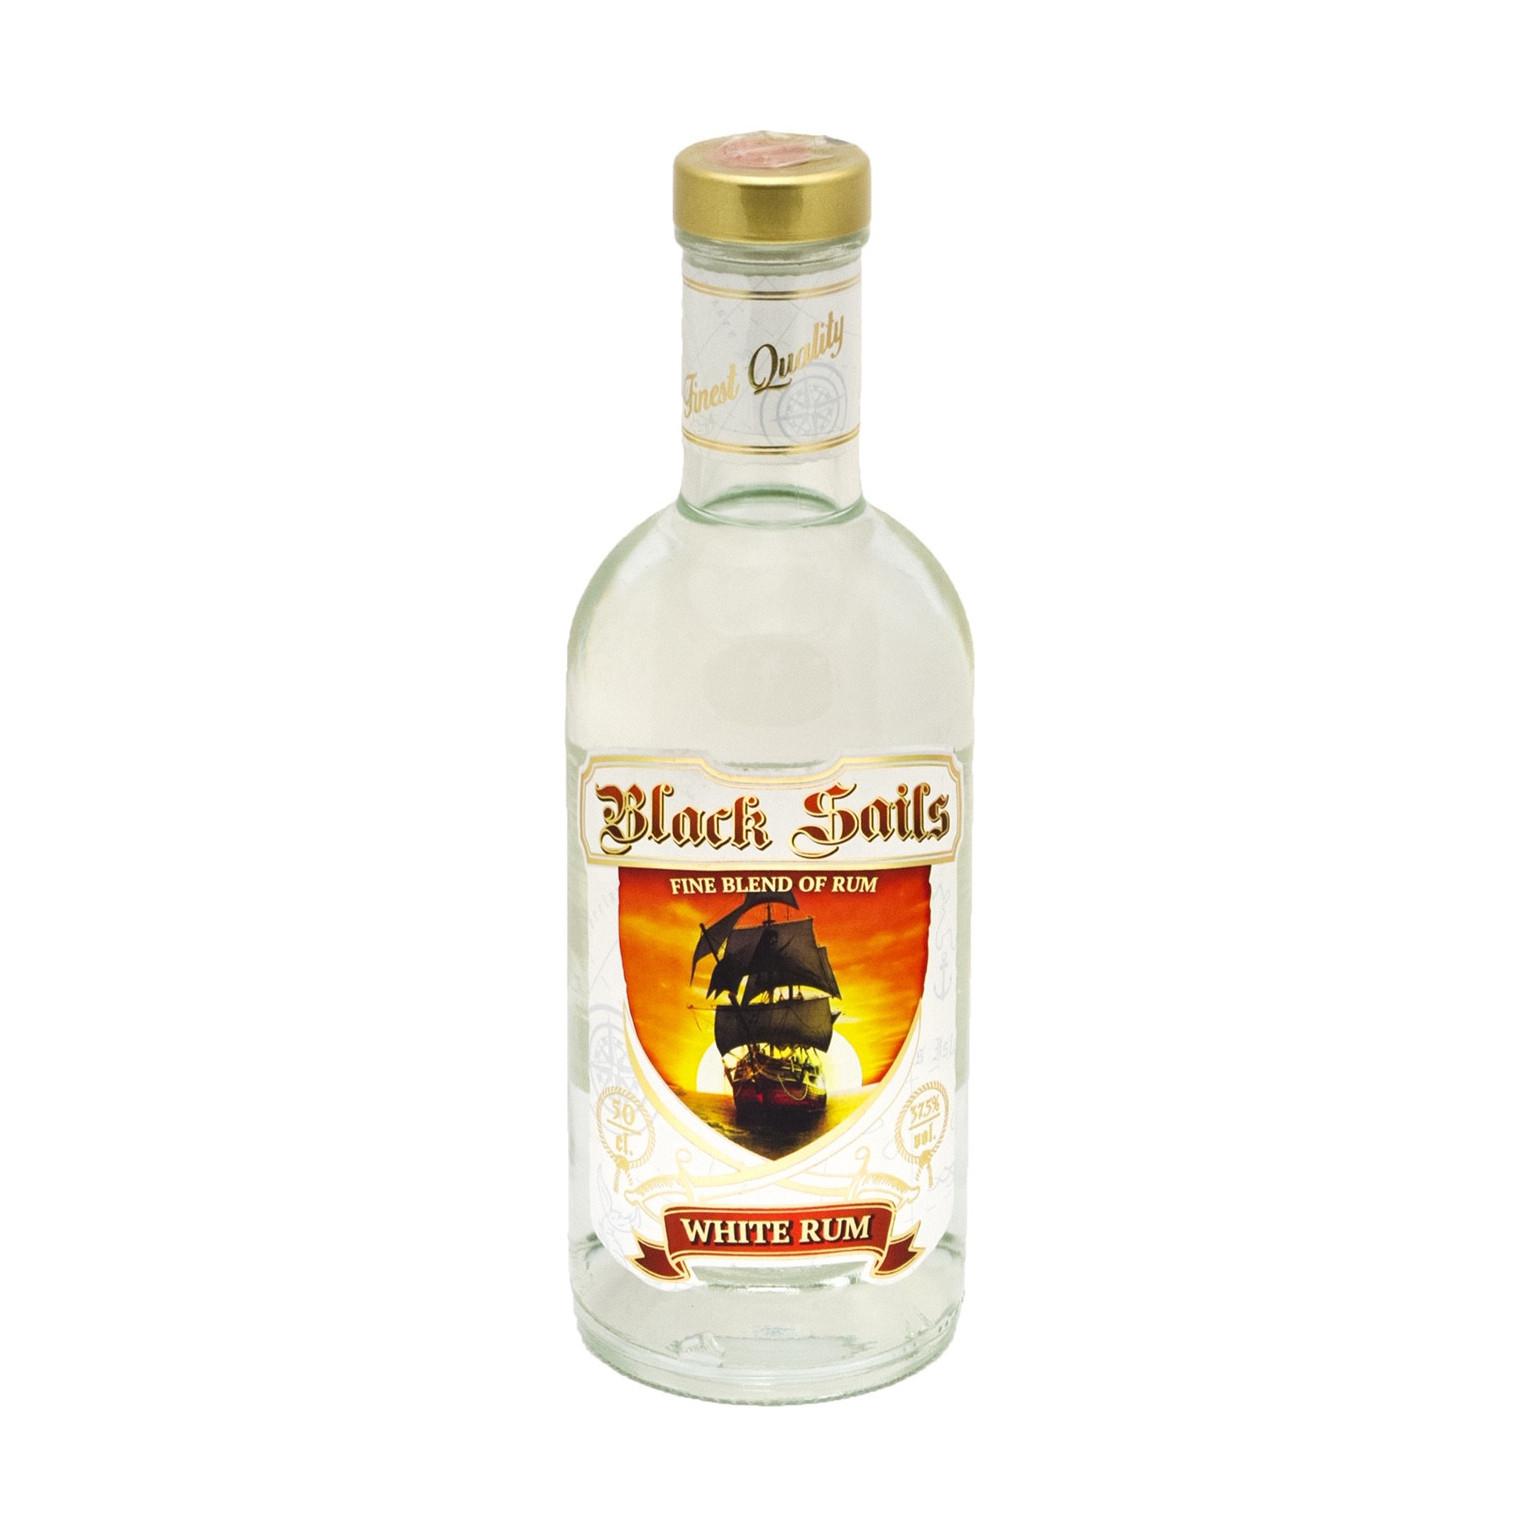 Rumm Black Sails White Rum 37,5% 50cl